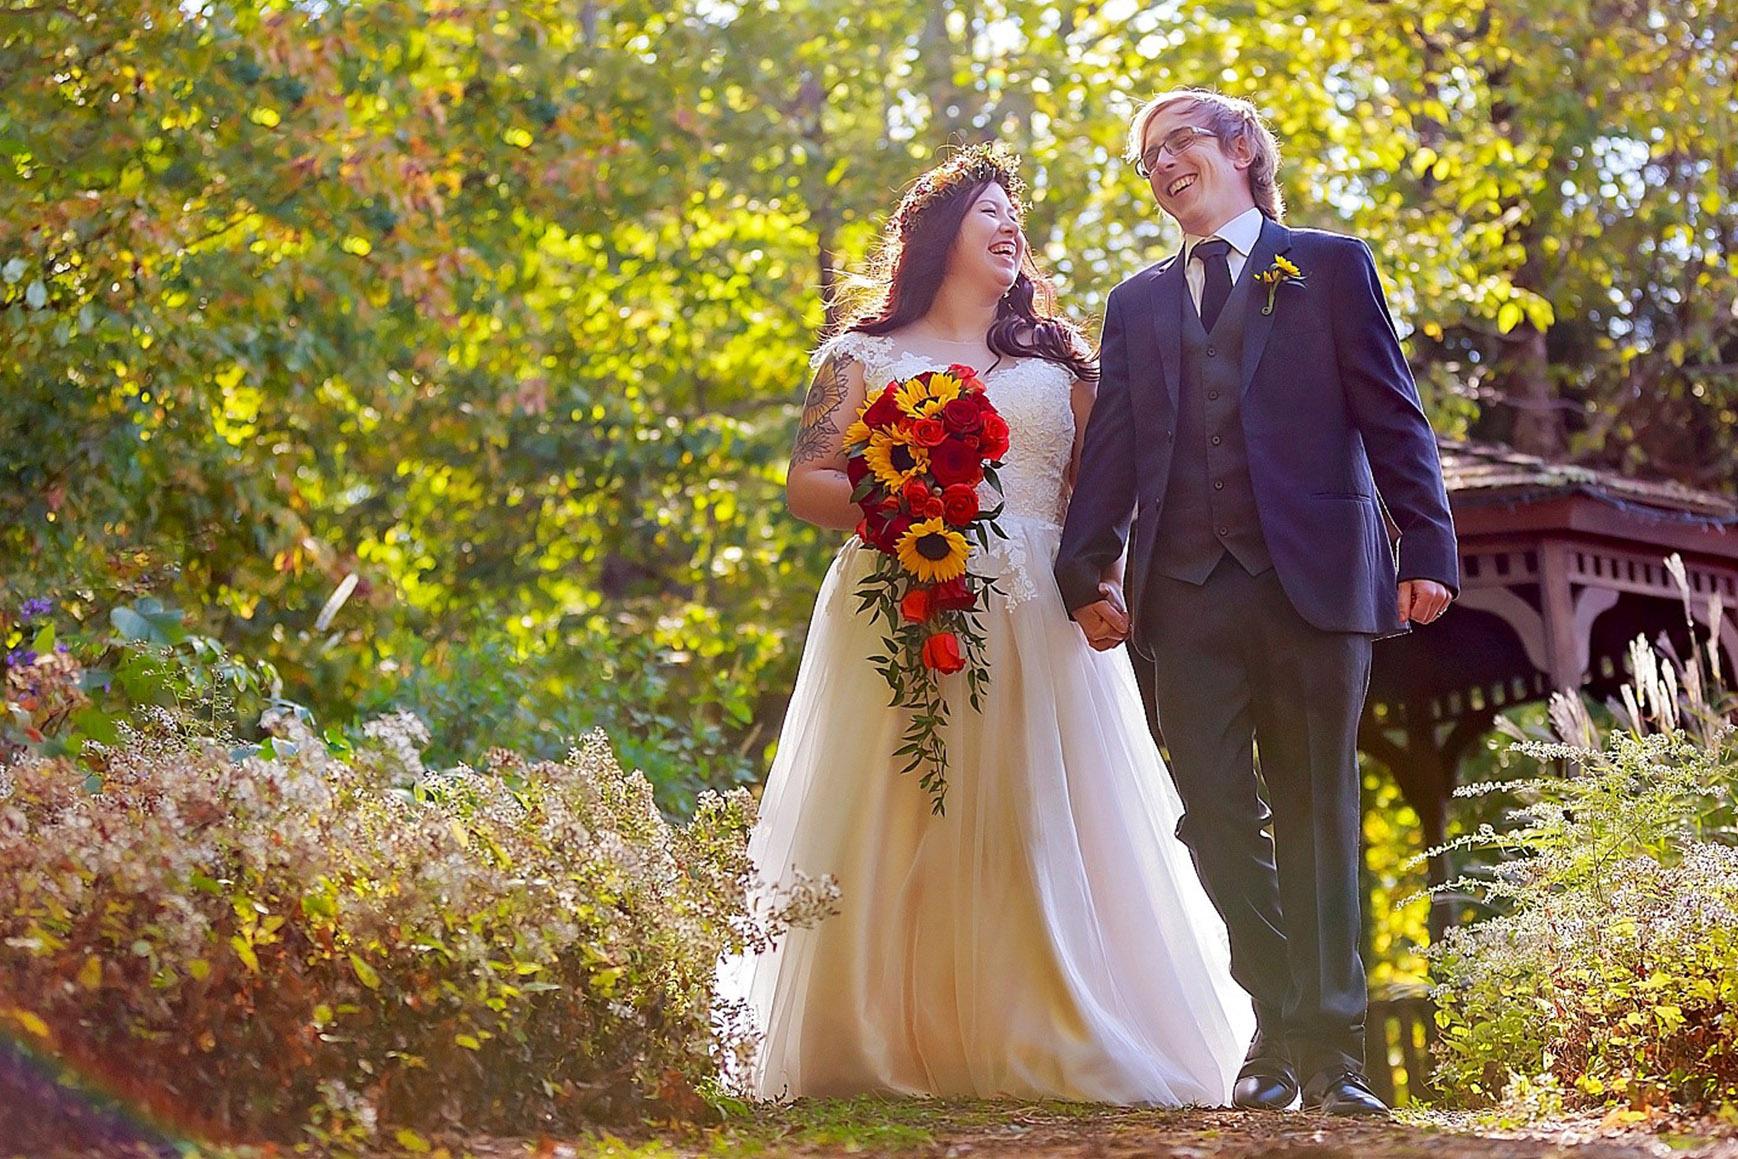 Fun Couple - Granite Rose - Hampstead, New Hampshire - Rockingham County - Wedgewood Weddings